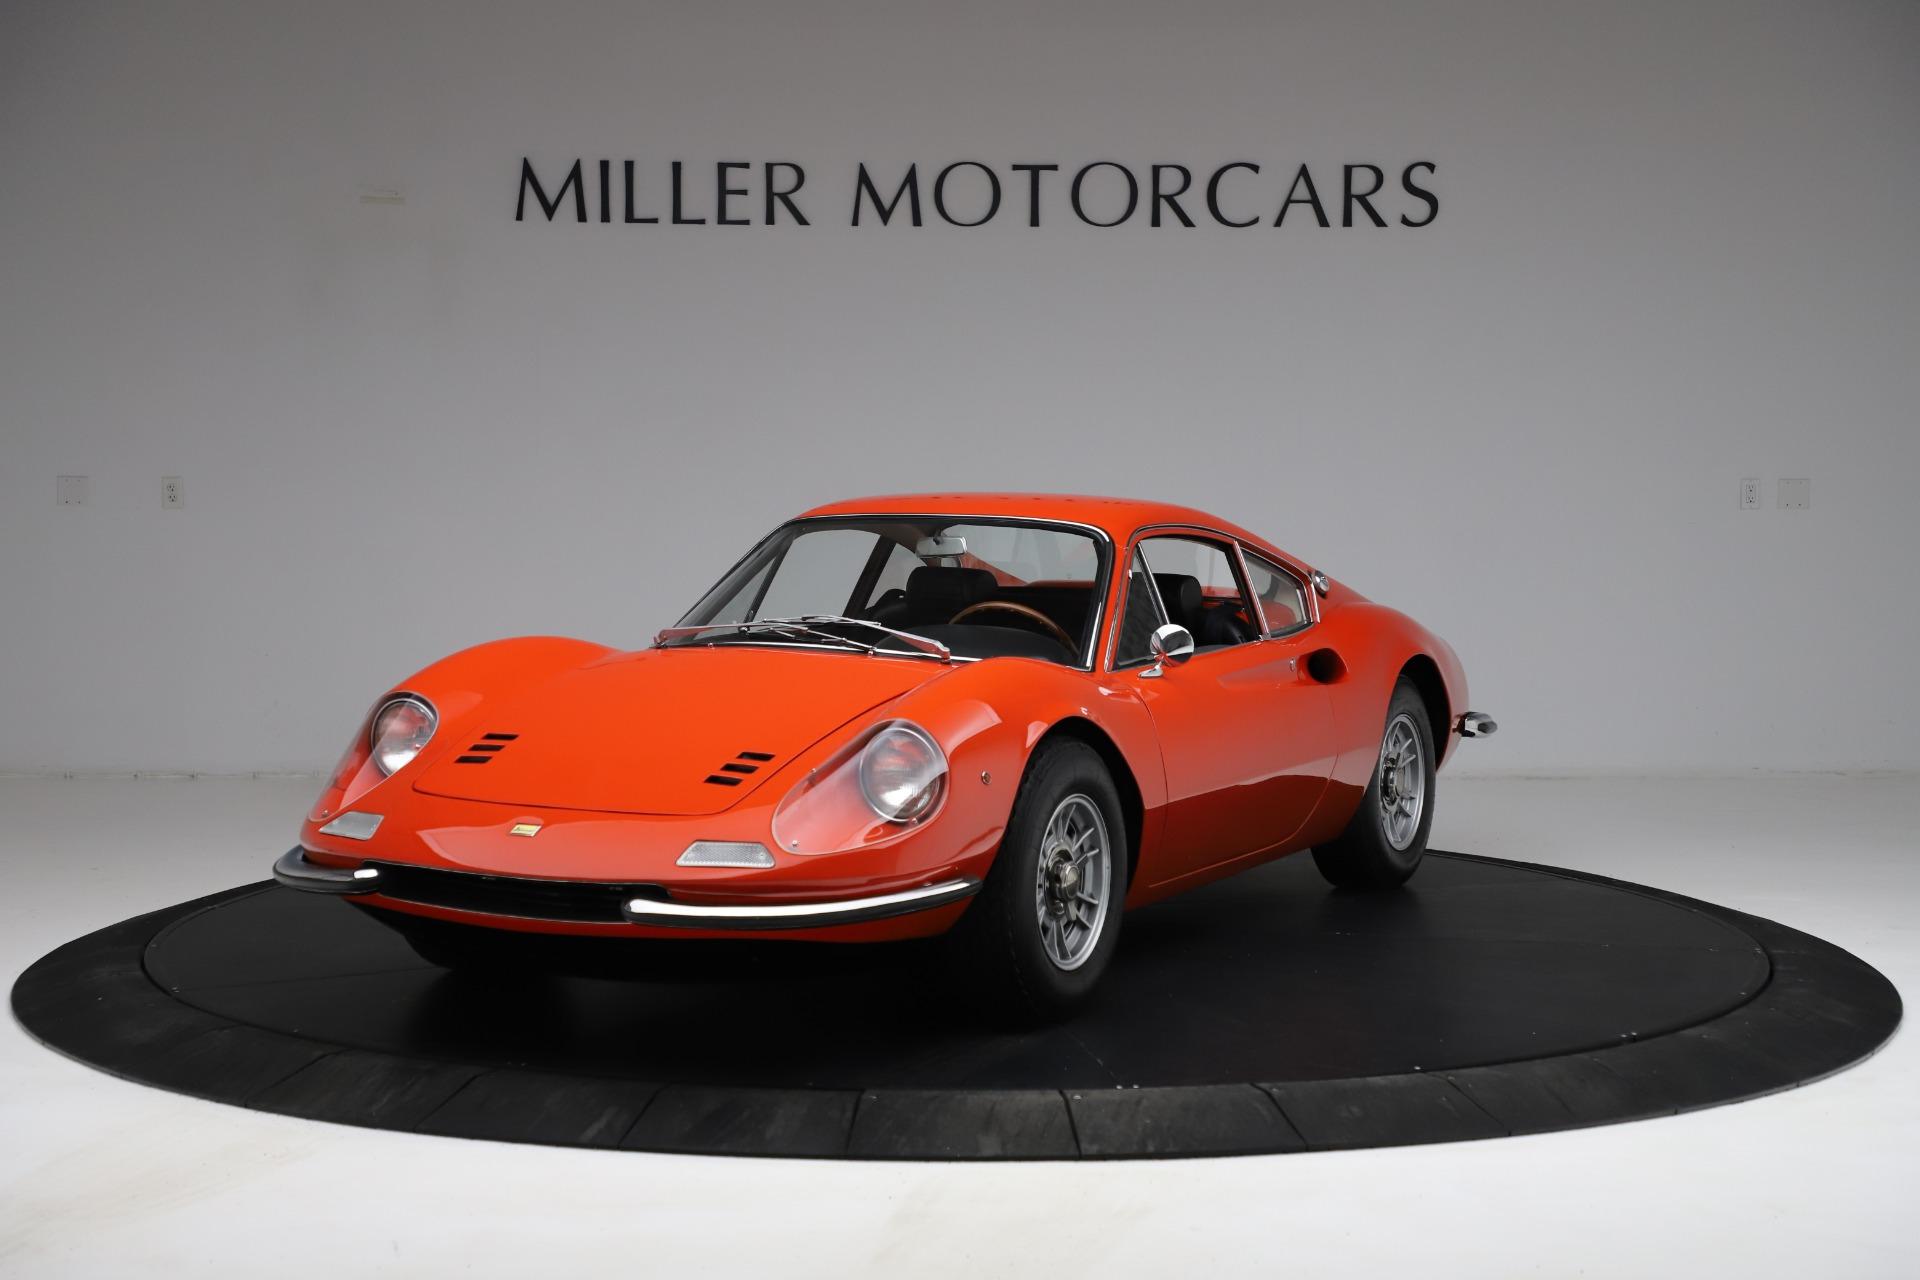 Used 1968 Ferrari 206 for sale $635,000 at McLaren Greenwich in Greenwich CT 06830 1